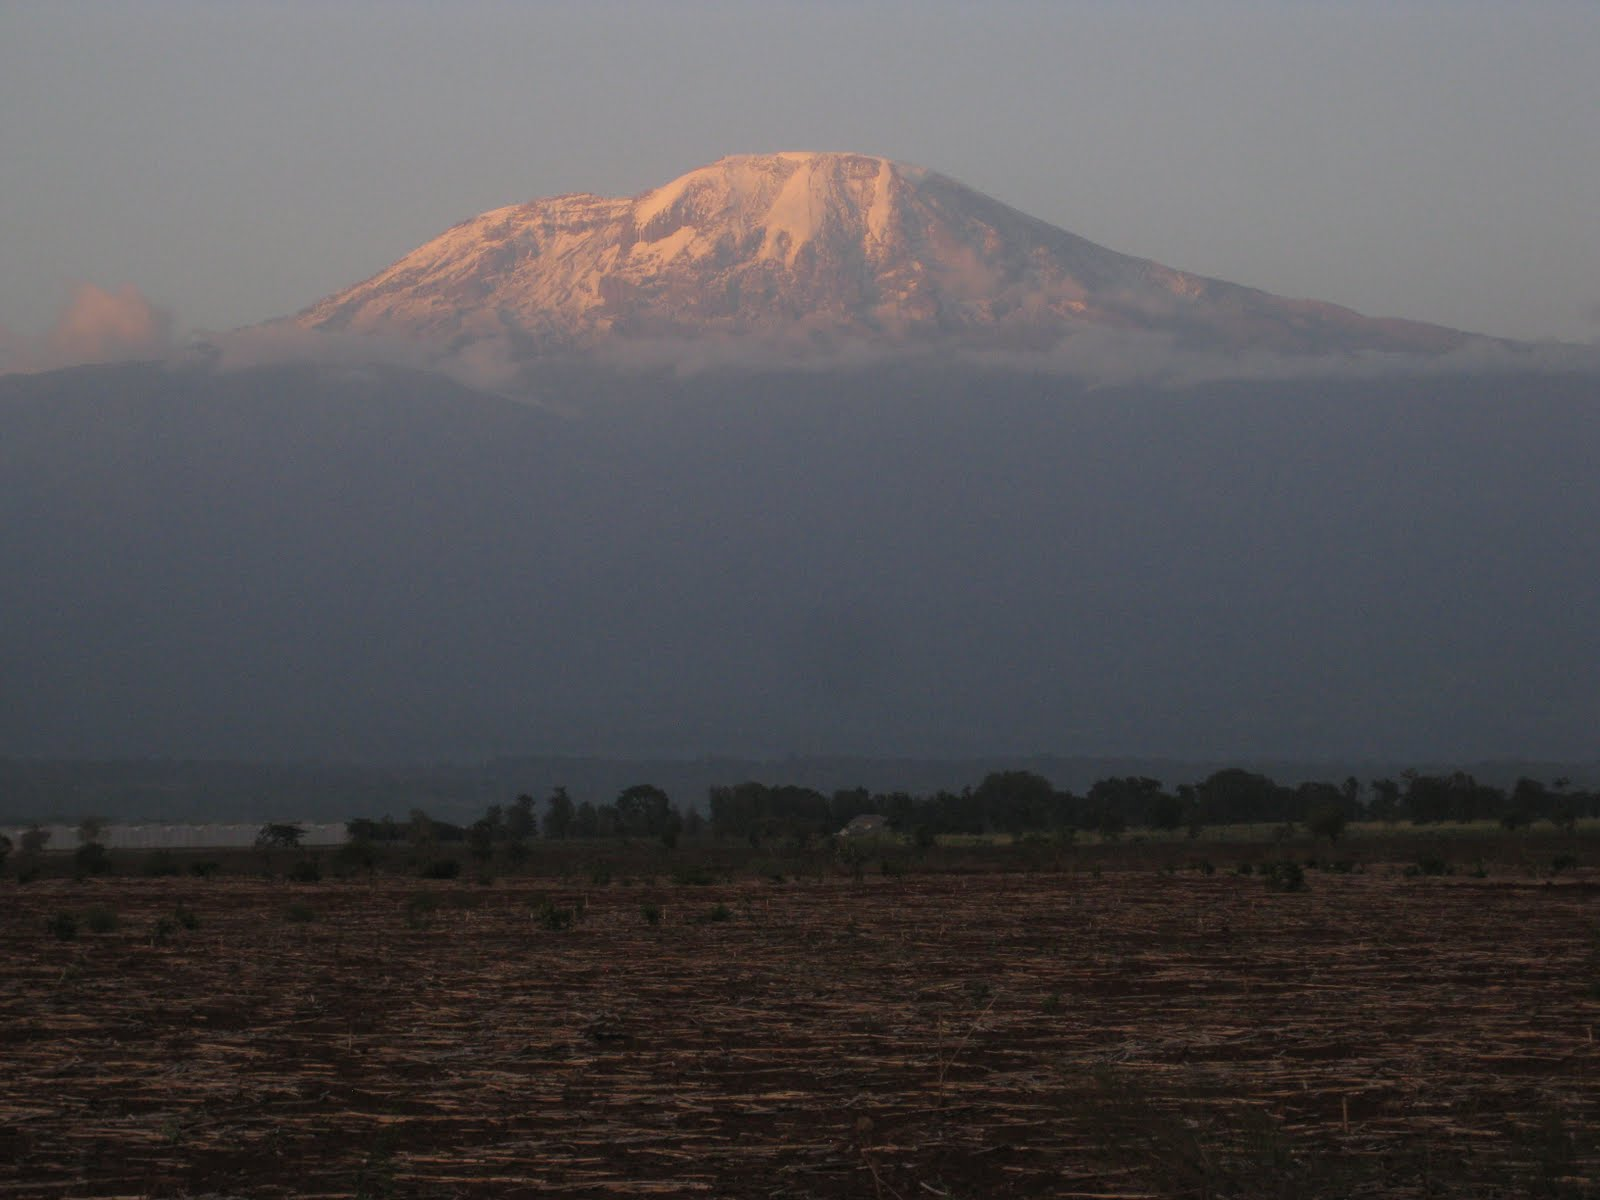 /wp-content/uploads/itineraries/Kilimanjaro/kili-mountain.jpg